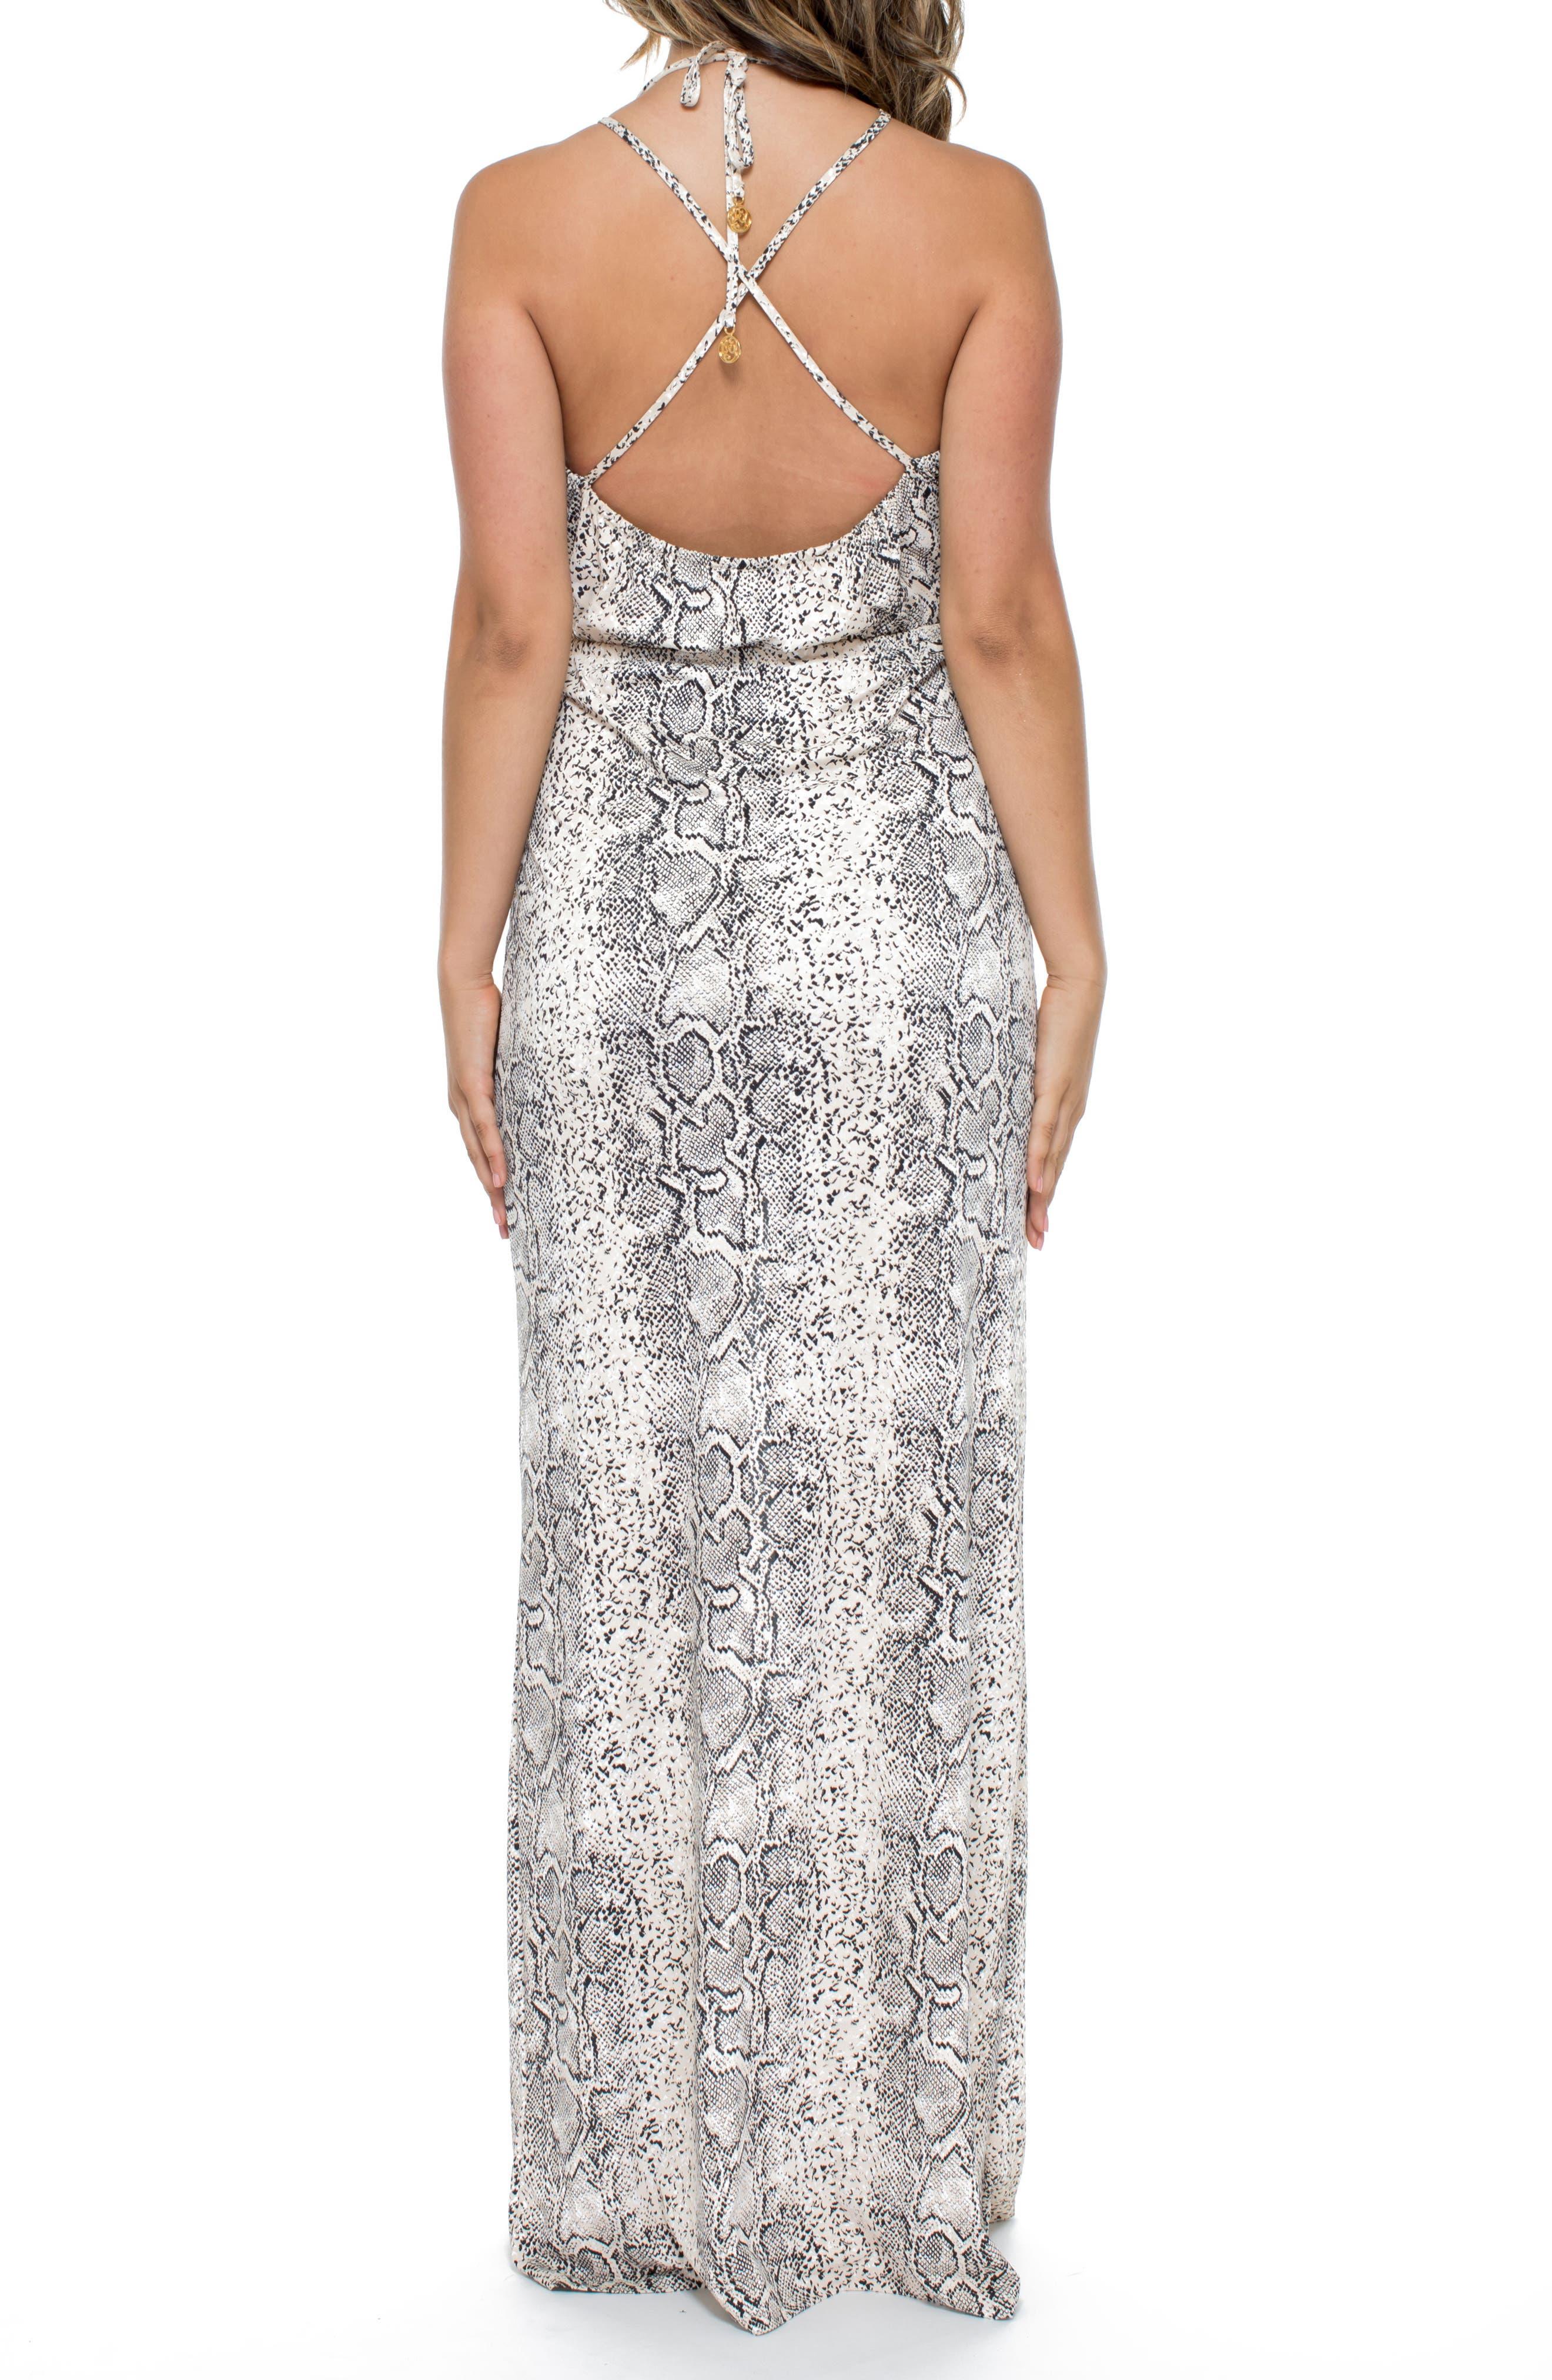 Snake Print Cover-Up Maxi Dress,                             Alternate thumbnail 2, color,                             250